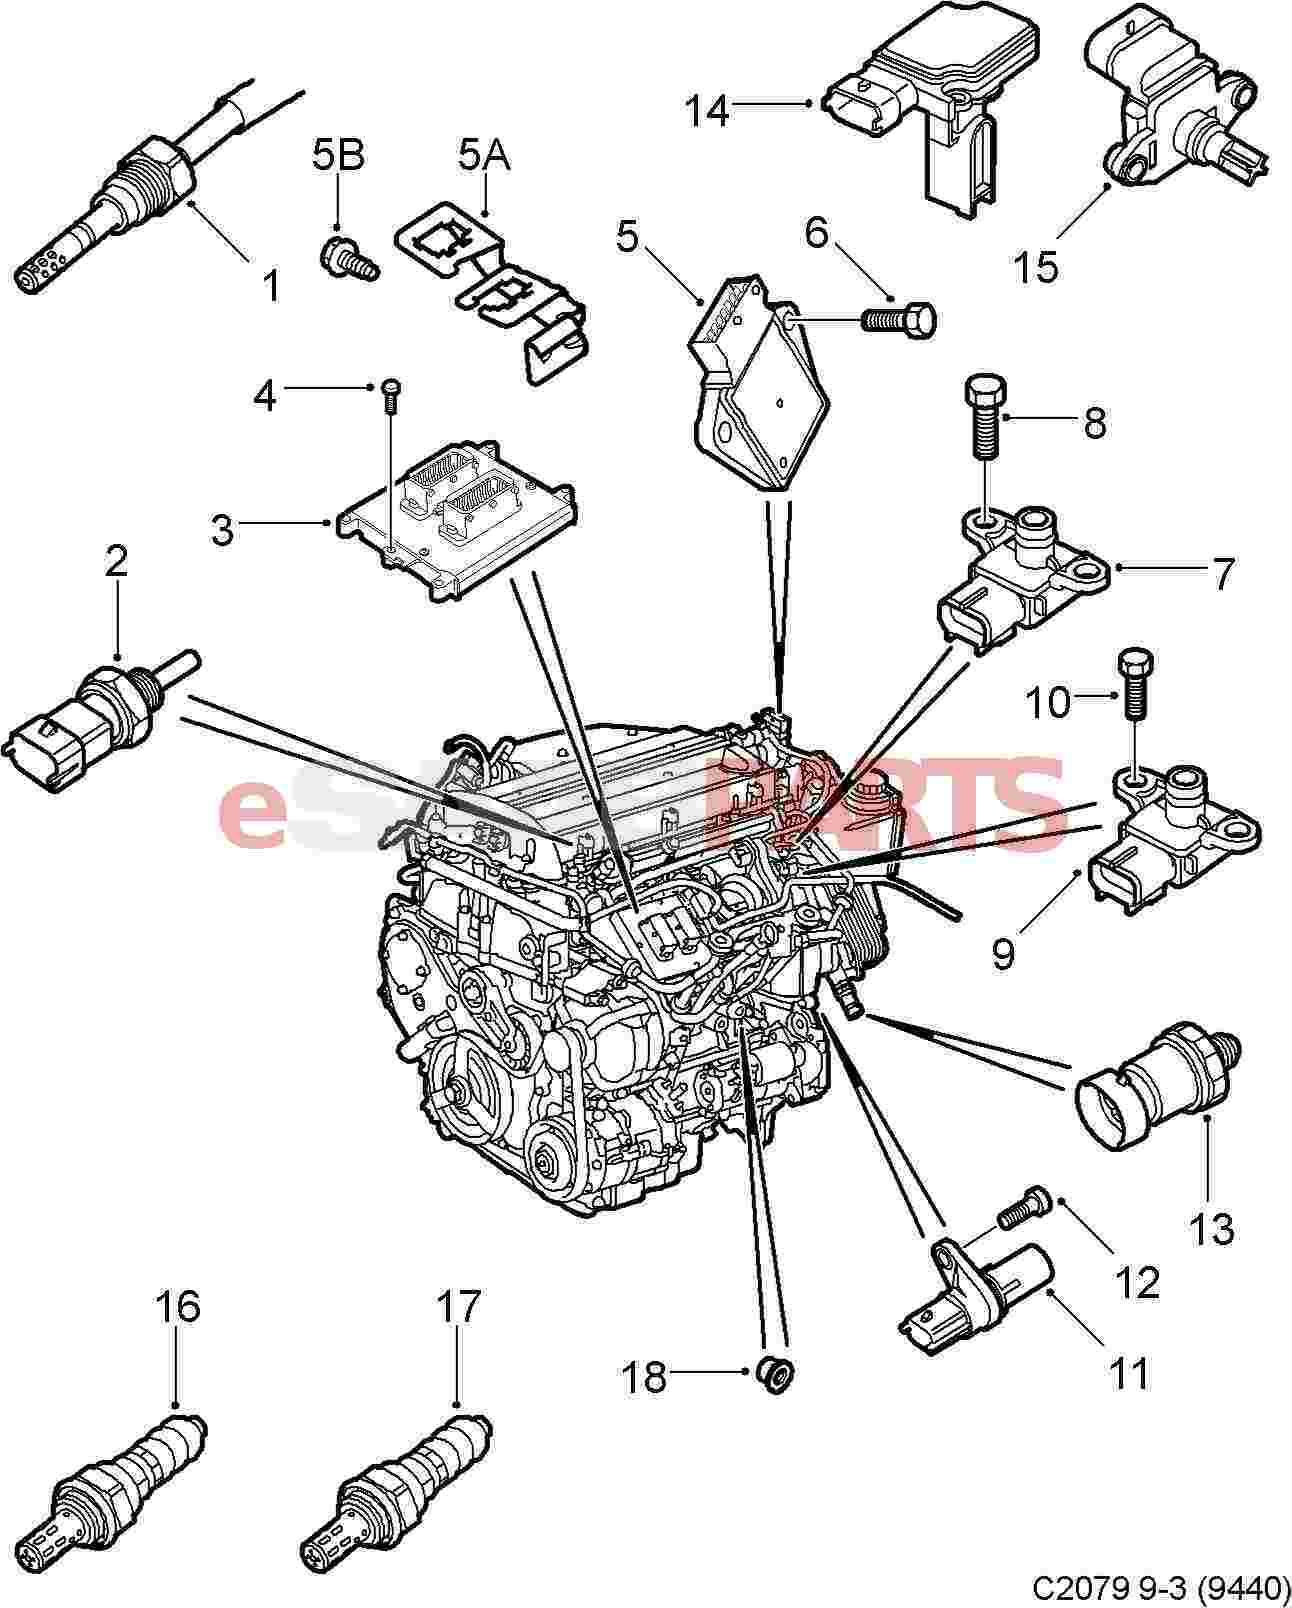 saab parts diagram all wiring diagram Saab Parts Diagram saab 9 3 engine schematics wiring diagrams saab 9 3 diagram saab parts diagram